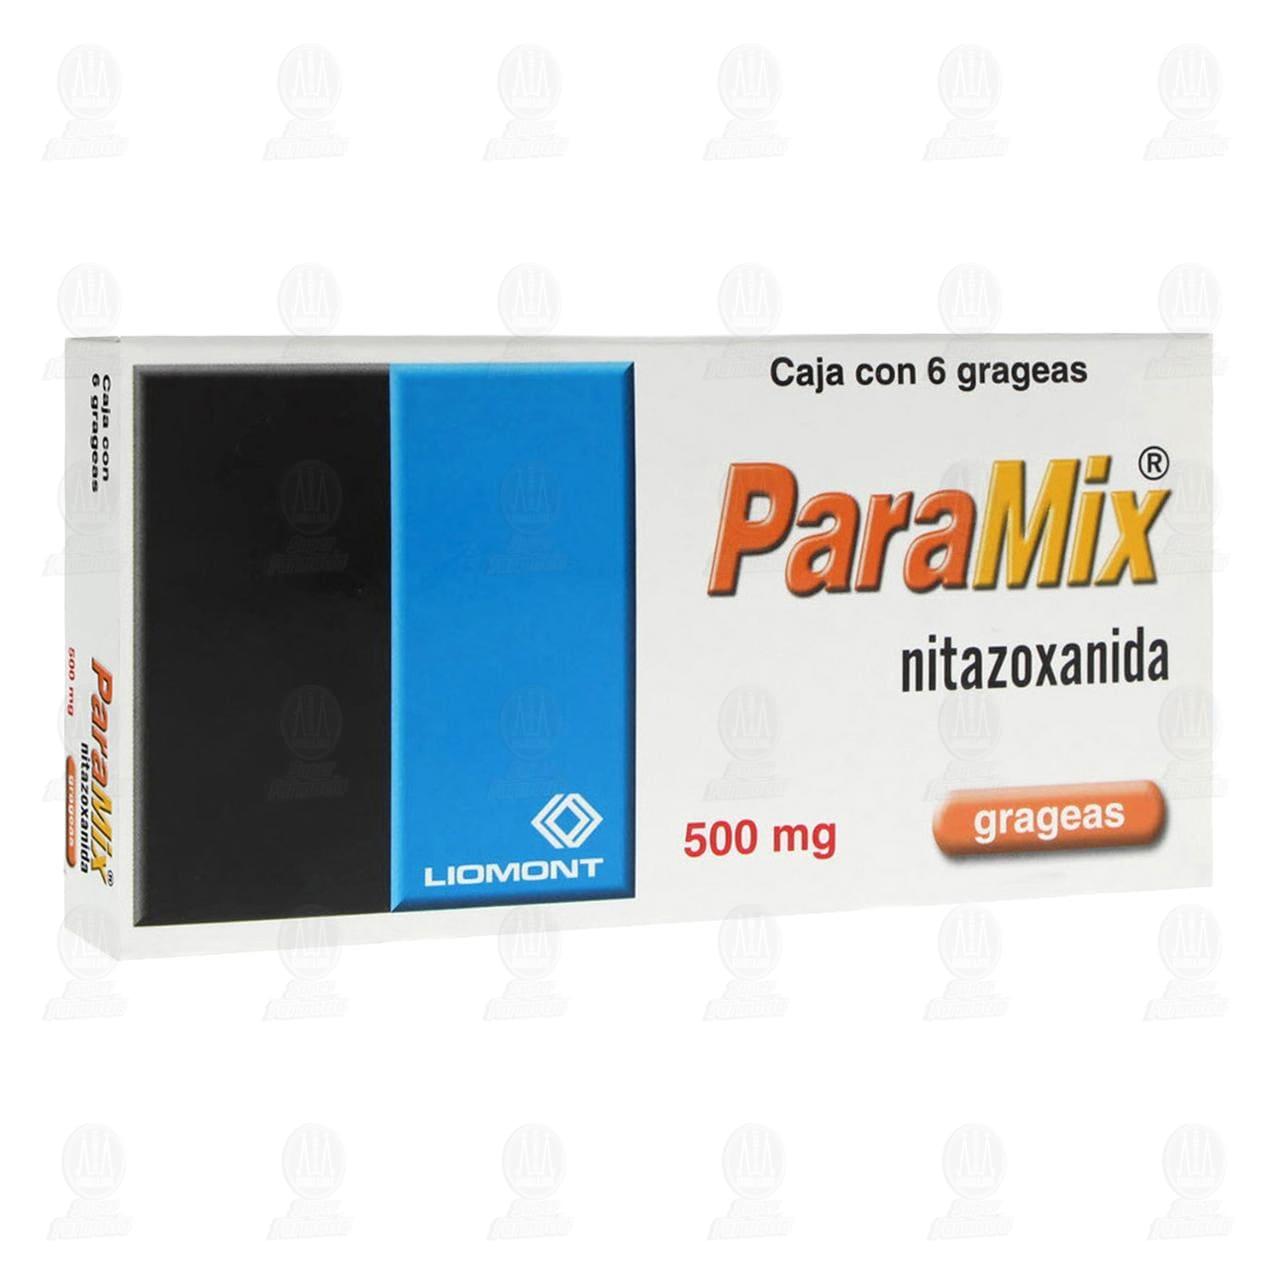 Comprar Paramix 500mg 6 Grageas en Farmacias Guadalajara